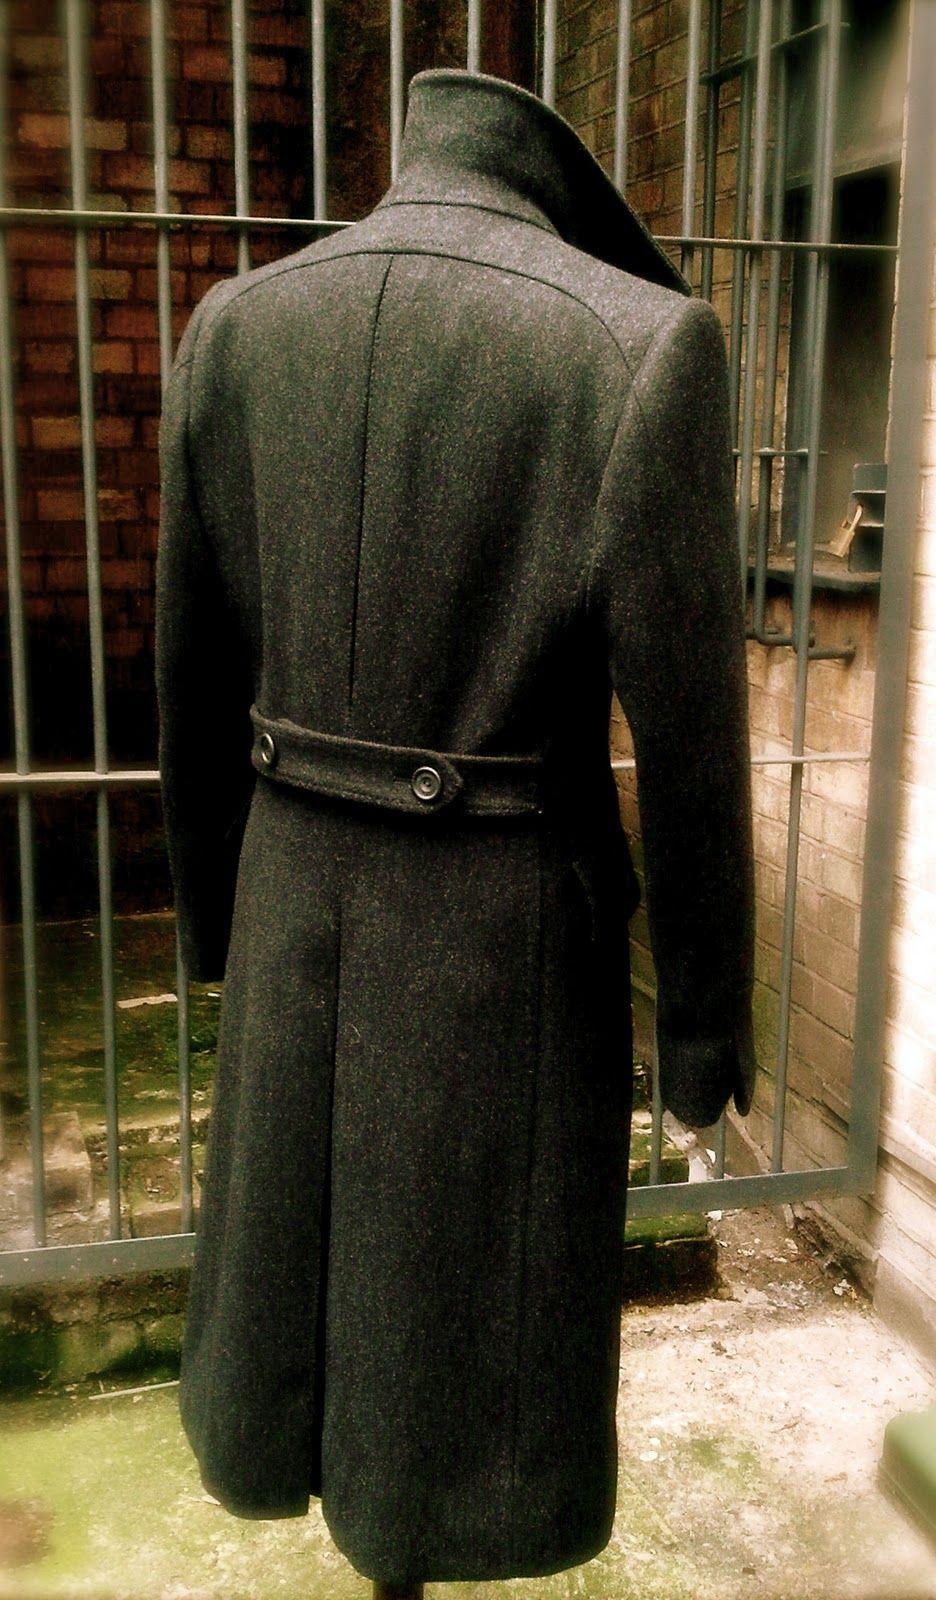 DAVIDE TAUB: Military Style 'Winter-Warm' Great Coat, 2010 ...